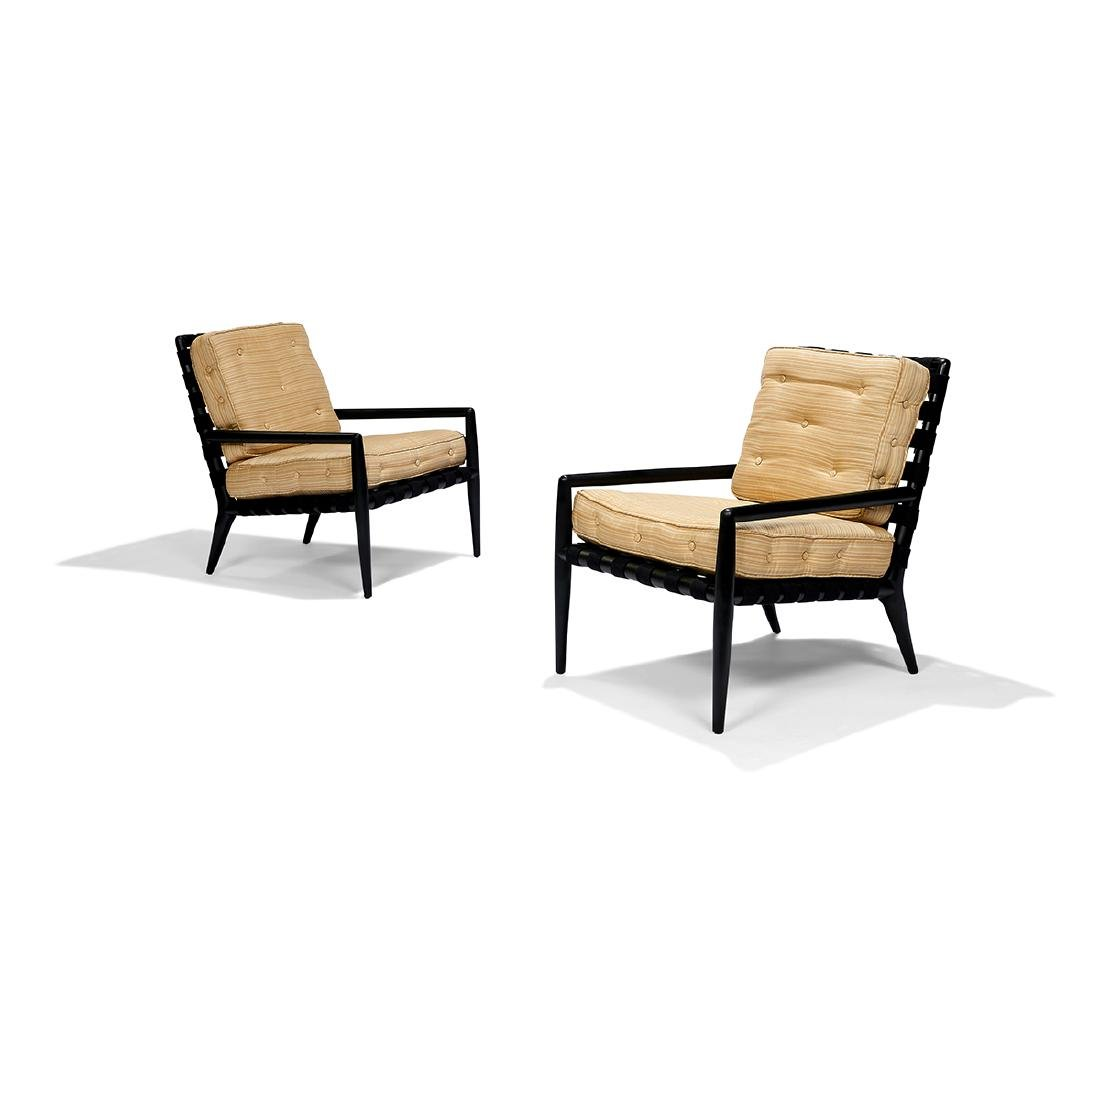 T.H. Robsjohn-Gibbings / Widdicomb lounge chairs